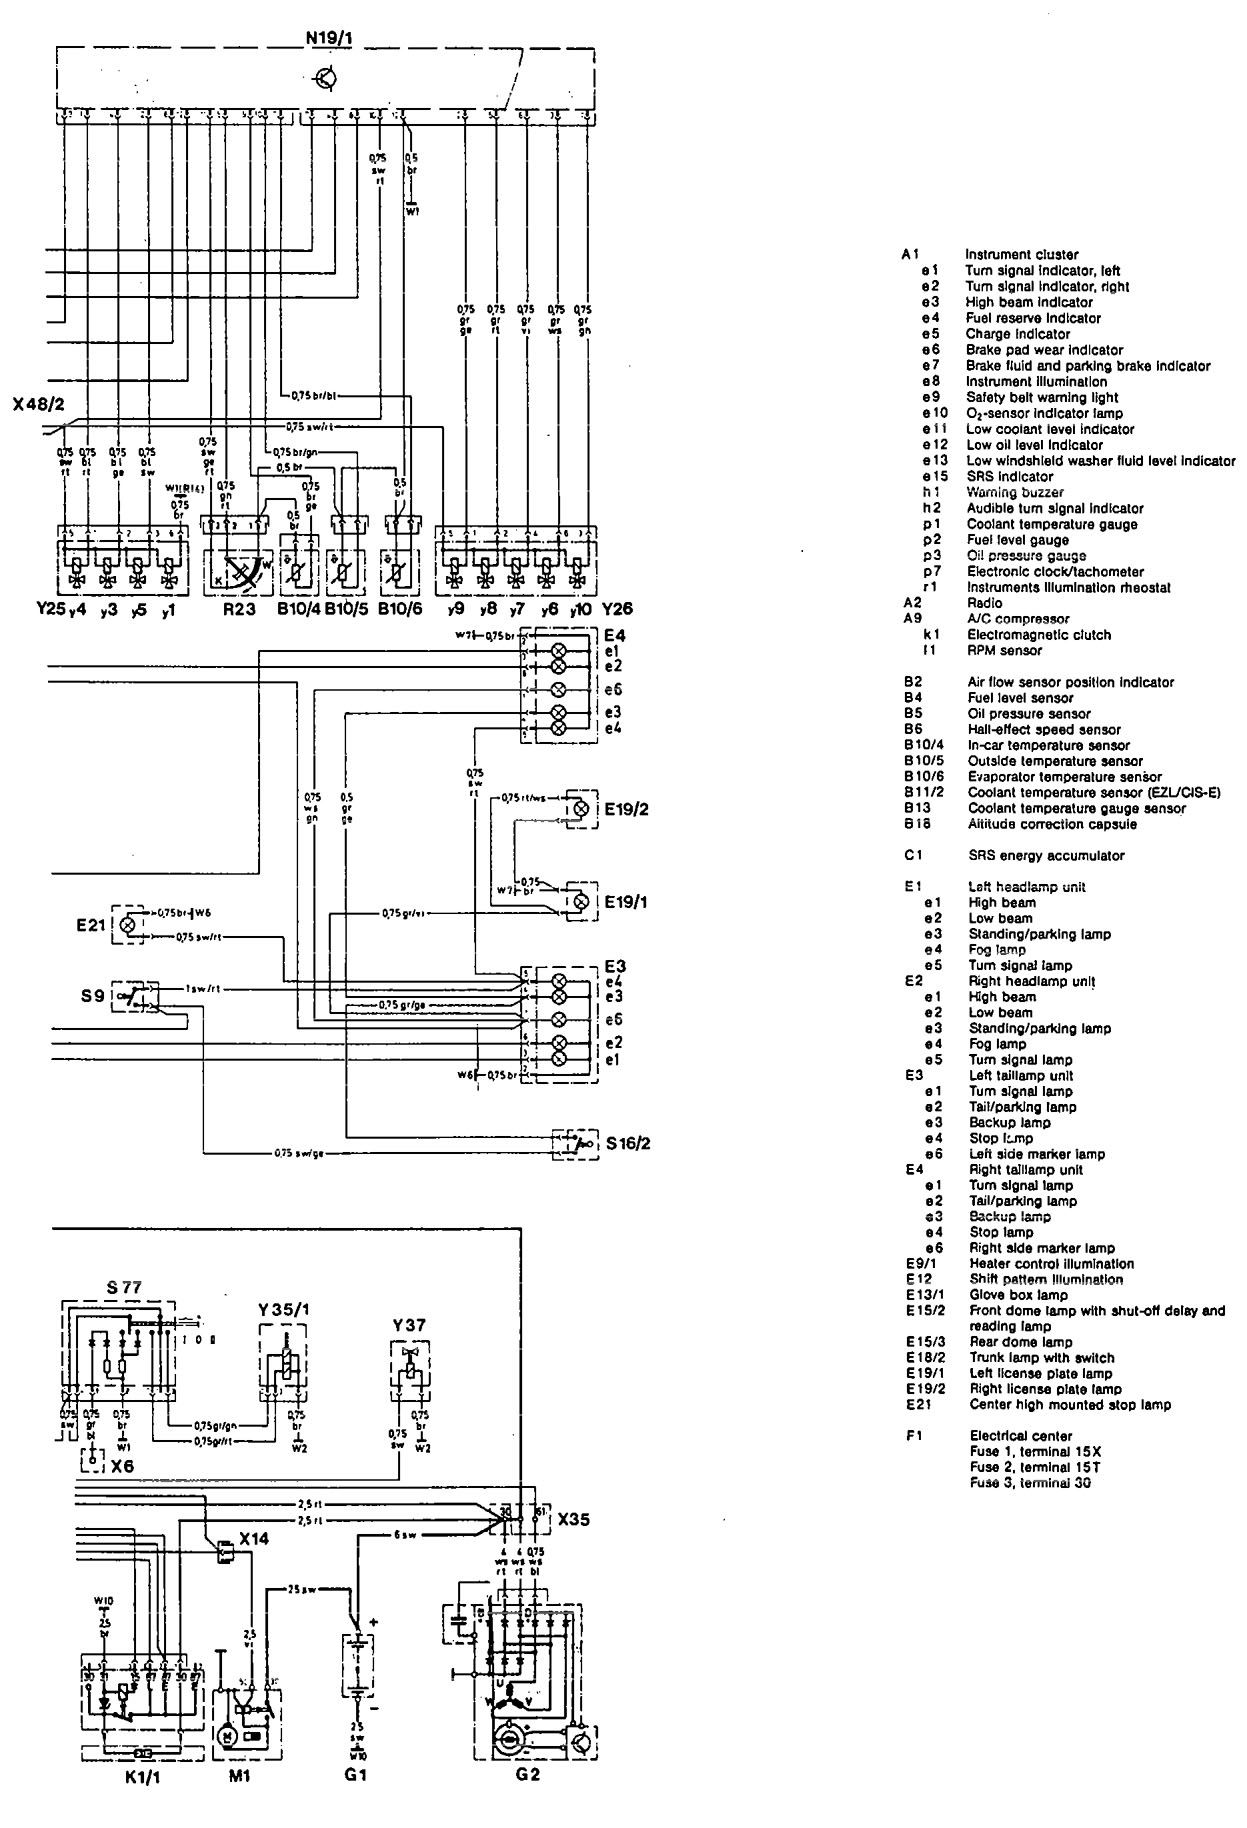 [SCHEMATICS_48DE]  TH_5915] Mercedes Benz Lights Wiring Diagram Download Diagram   1992 Mercedes E300 Wiring Diagram      Opogo Basi Bemua Cette Mohammedshrine Librar Wiring 101